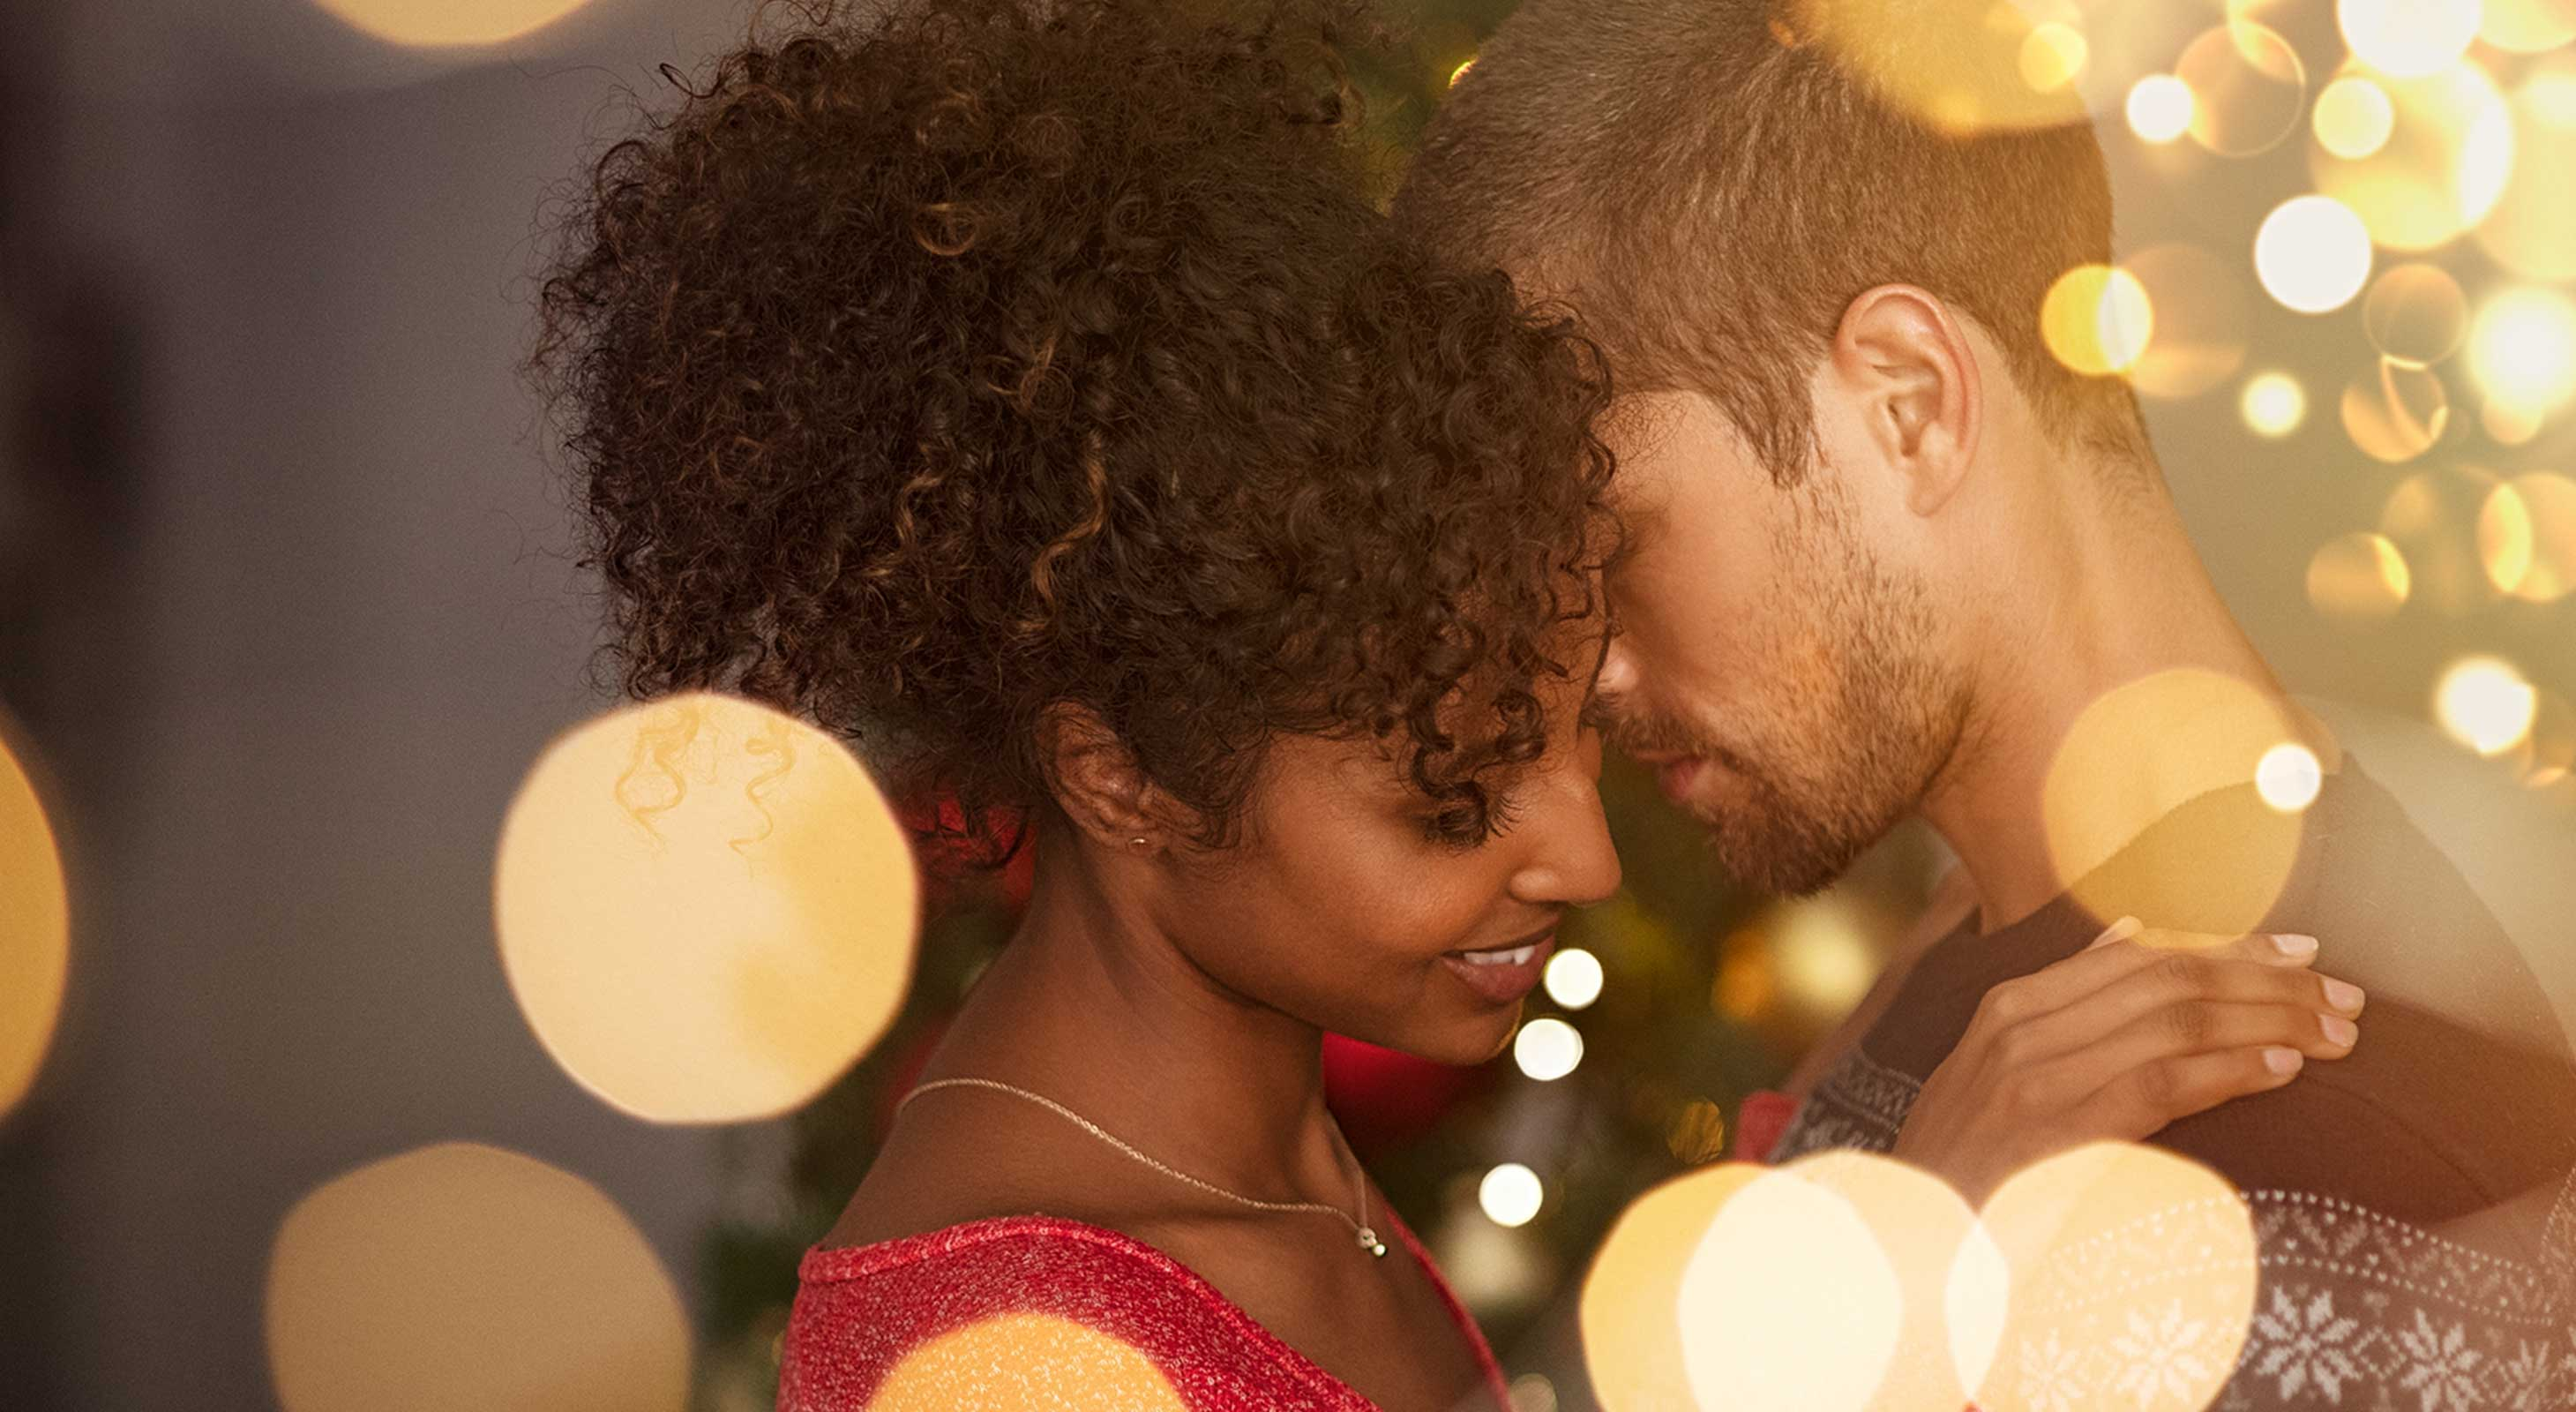 Romantic Getaway in the Berkshires - Couple embracing